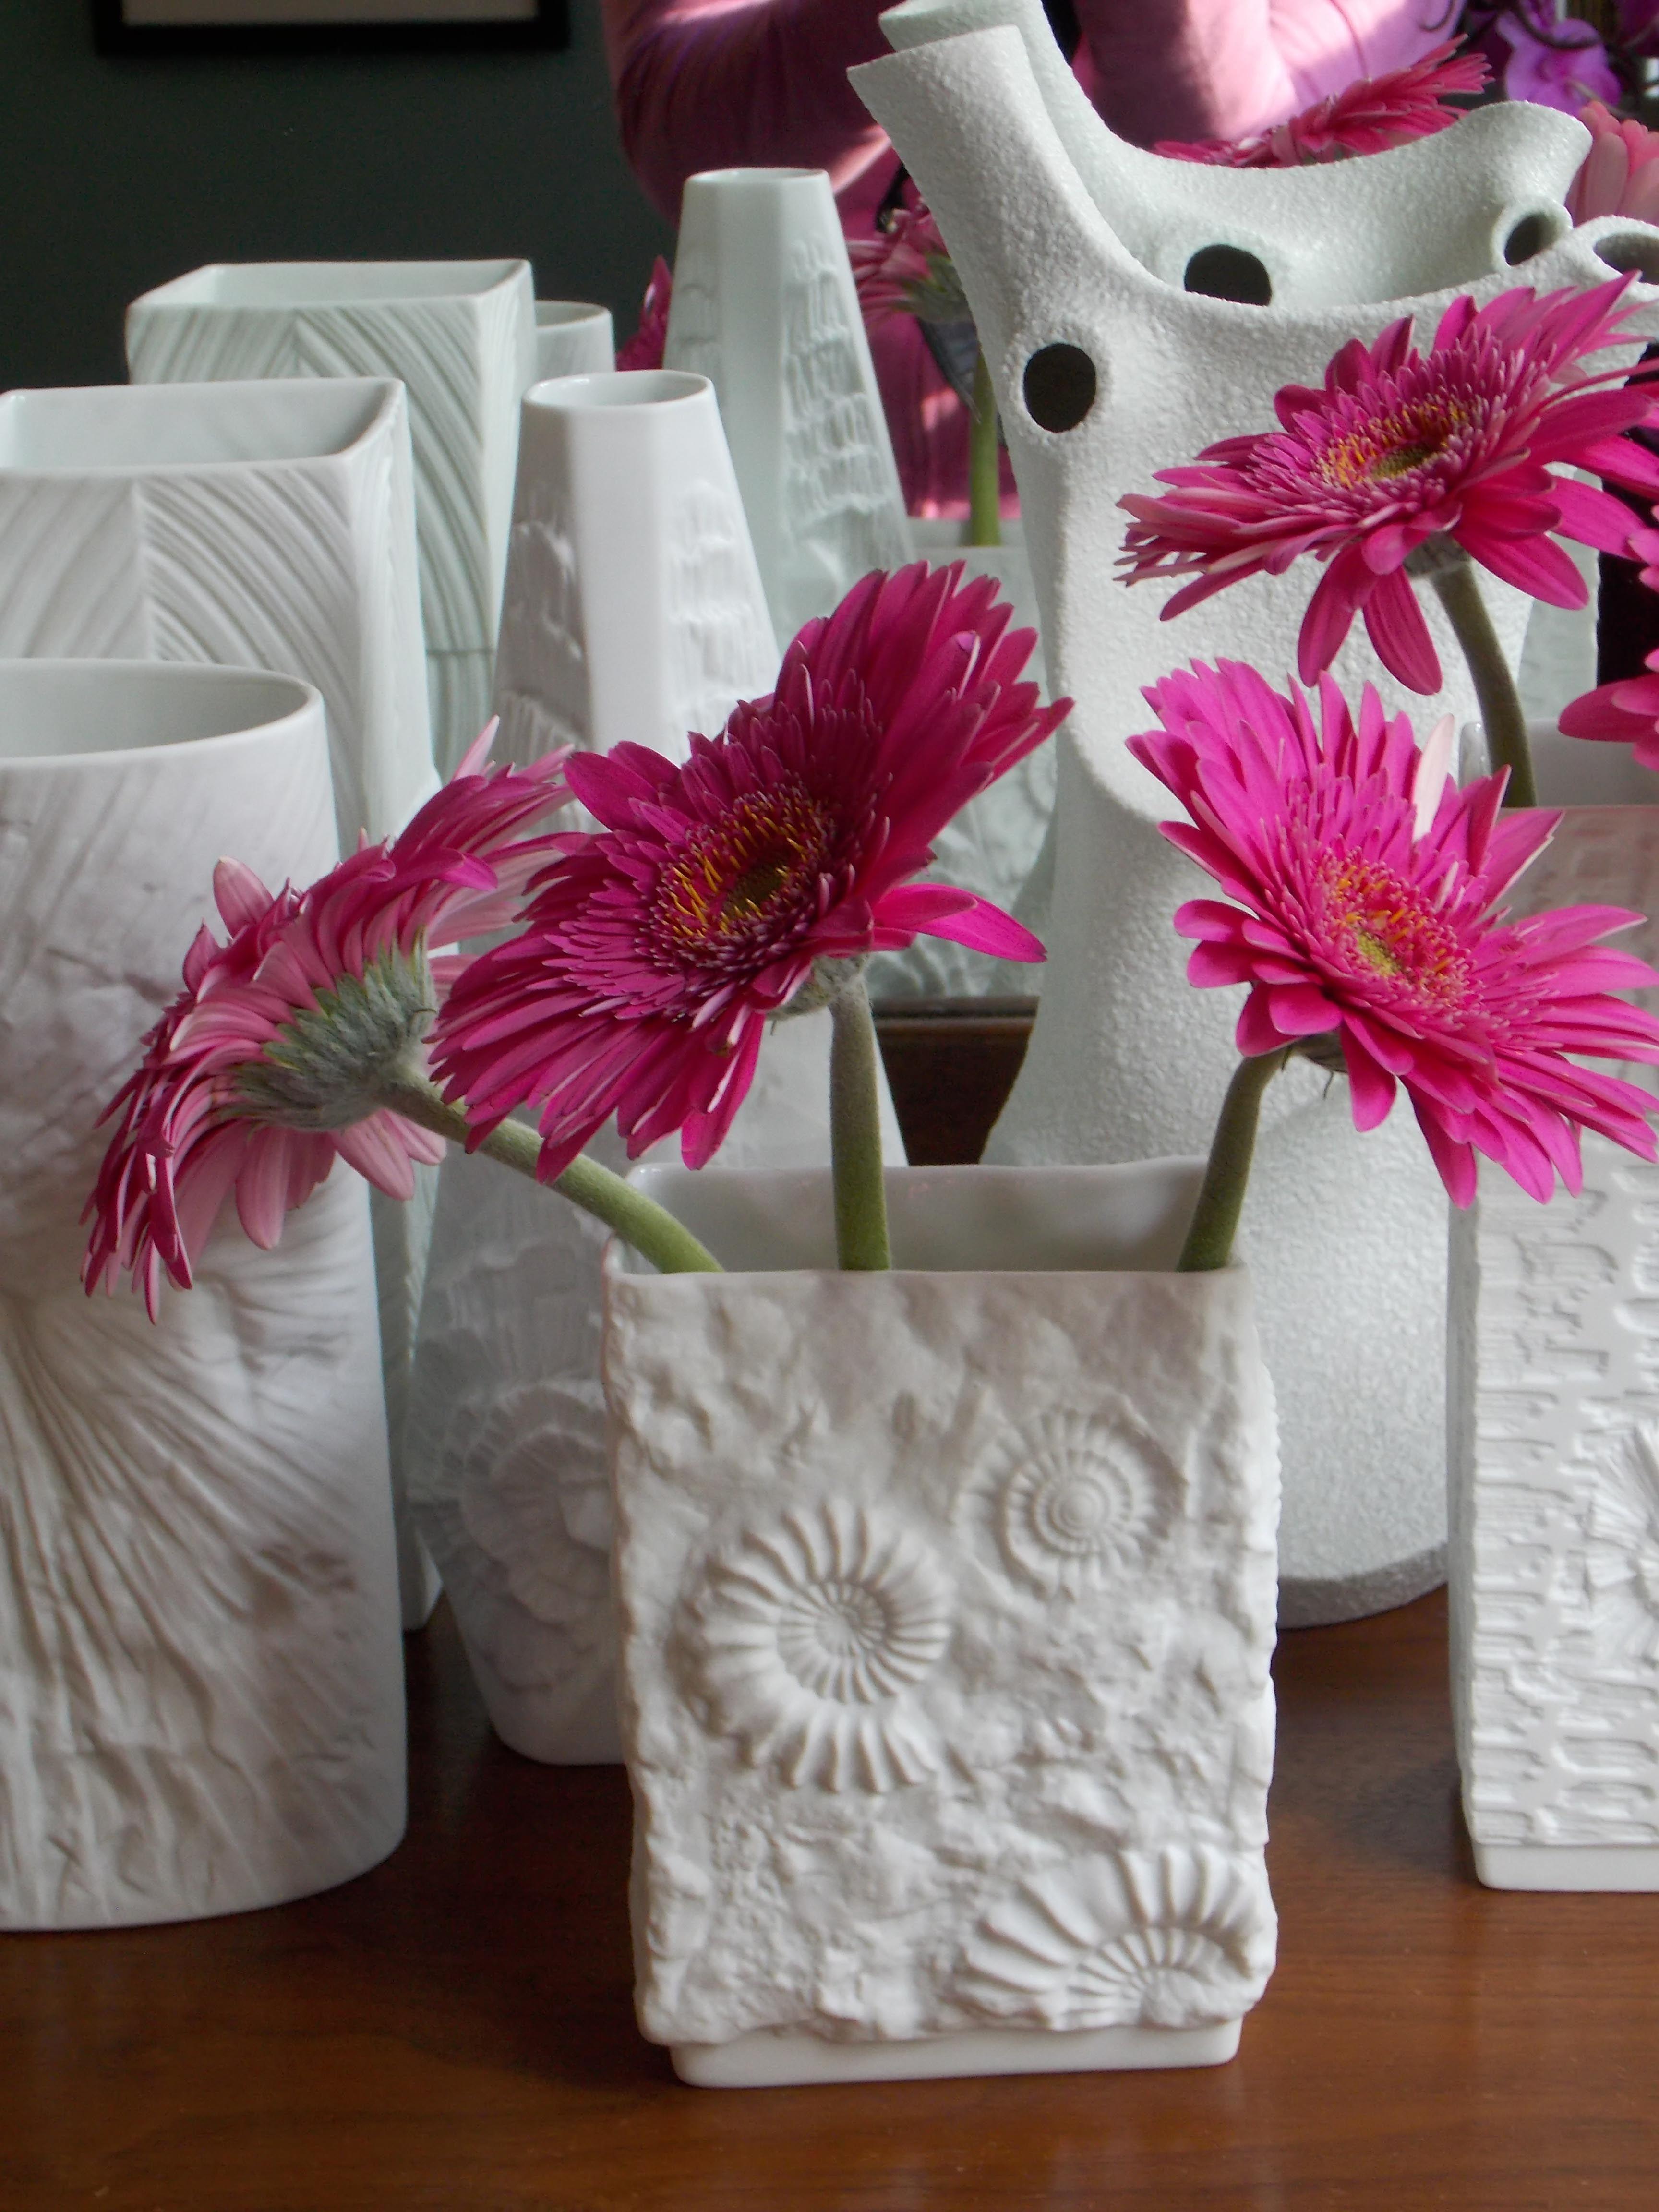 White vintage german porcelain vases midcenturyfla httpswww white vintage german porcelain vases midcenturyfla httpsetsy floridaeventfo Choice Image